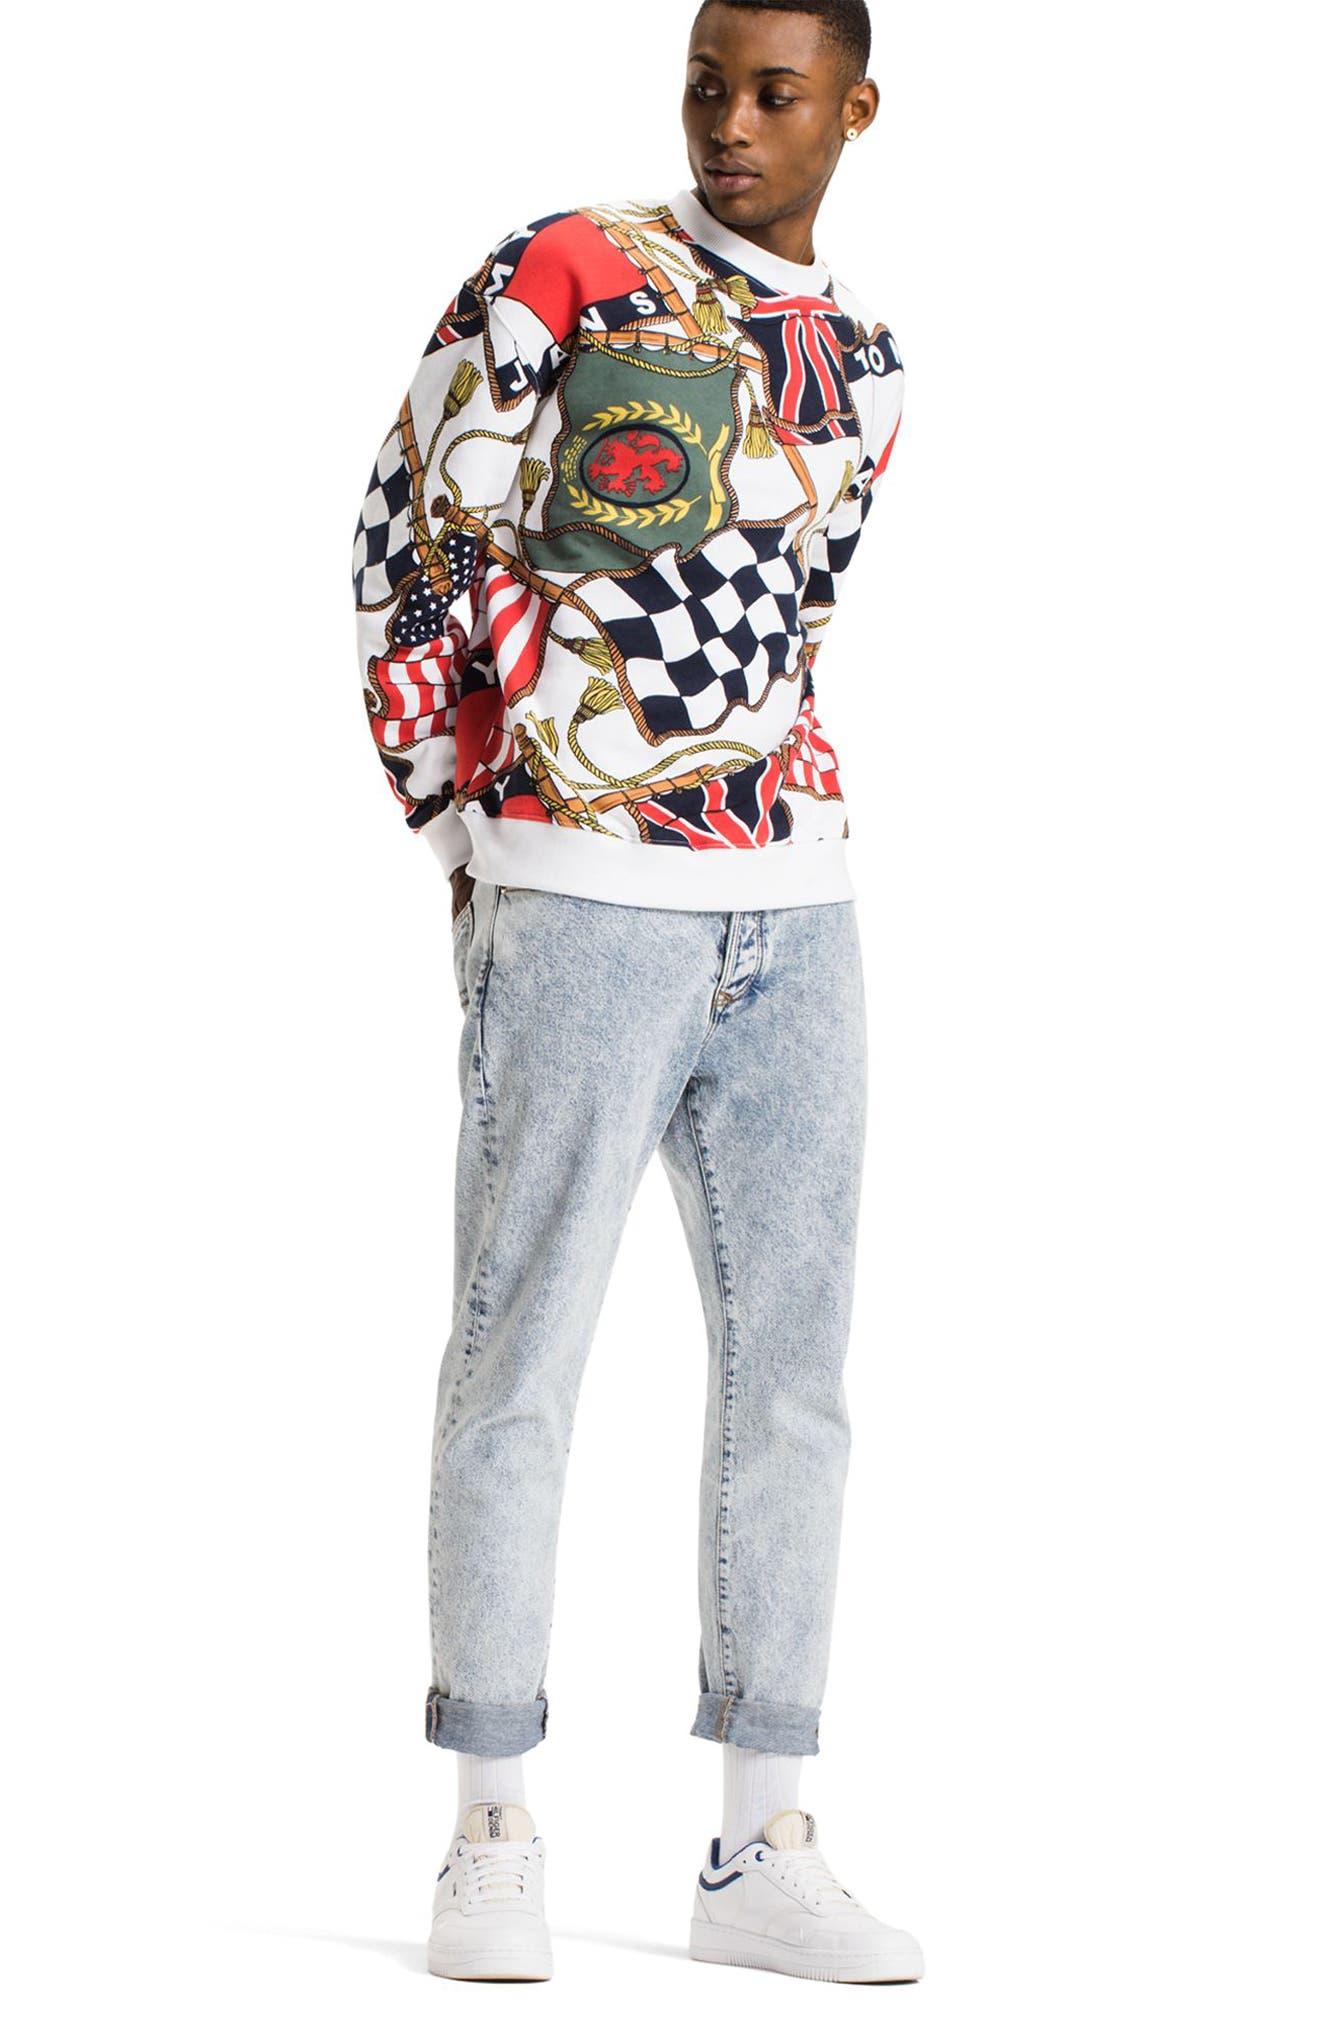 TOMMY HILFIGER,                             90s Sweatshirt,                             Alternate thumbnail 8, color,                             101